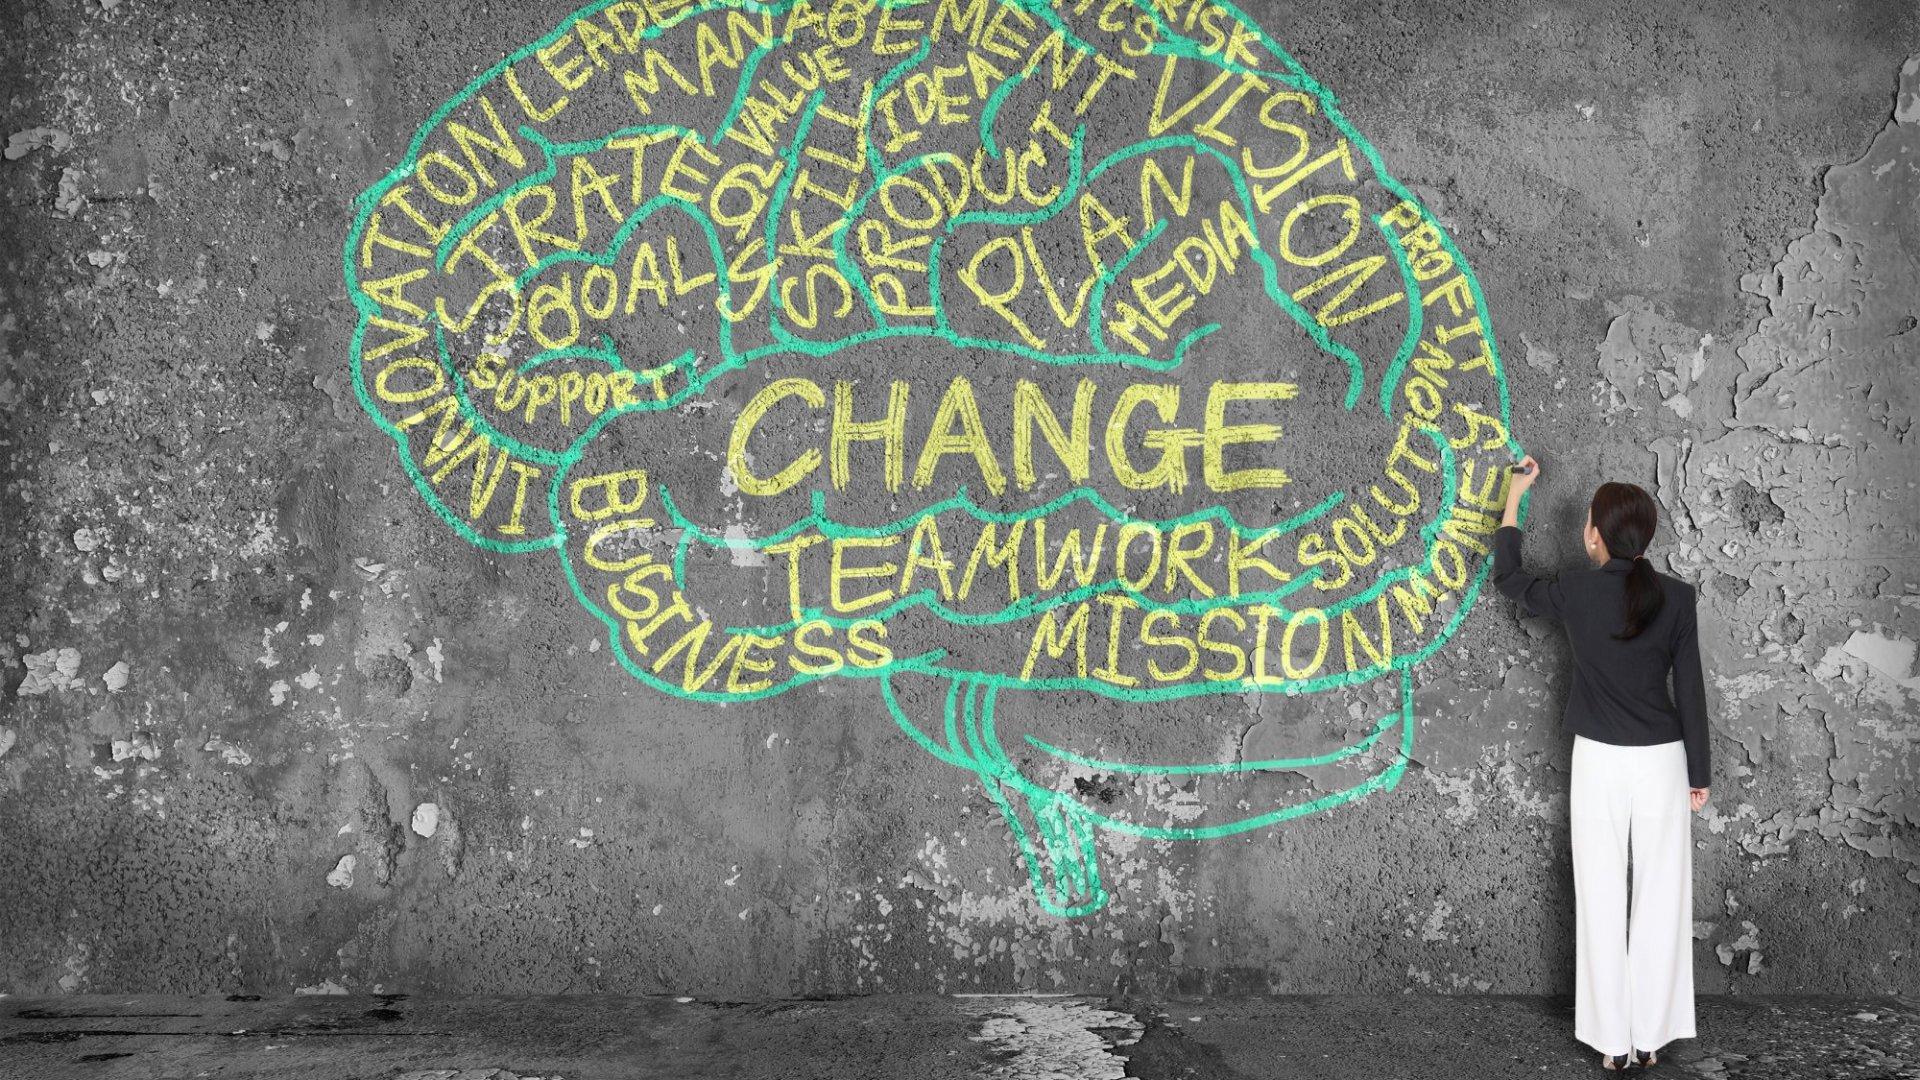 6 Reasons Change Management Strategies Fail